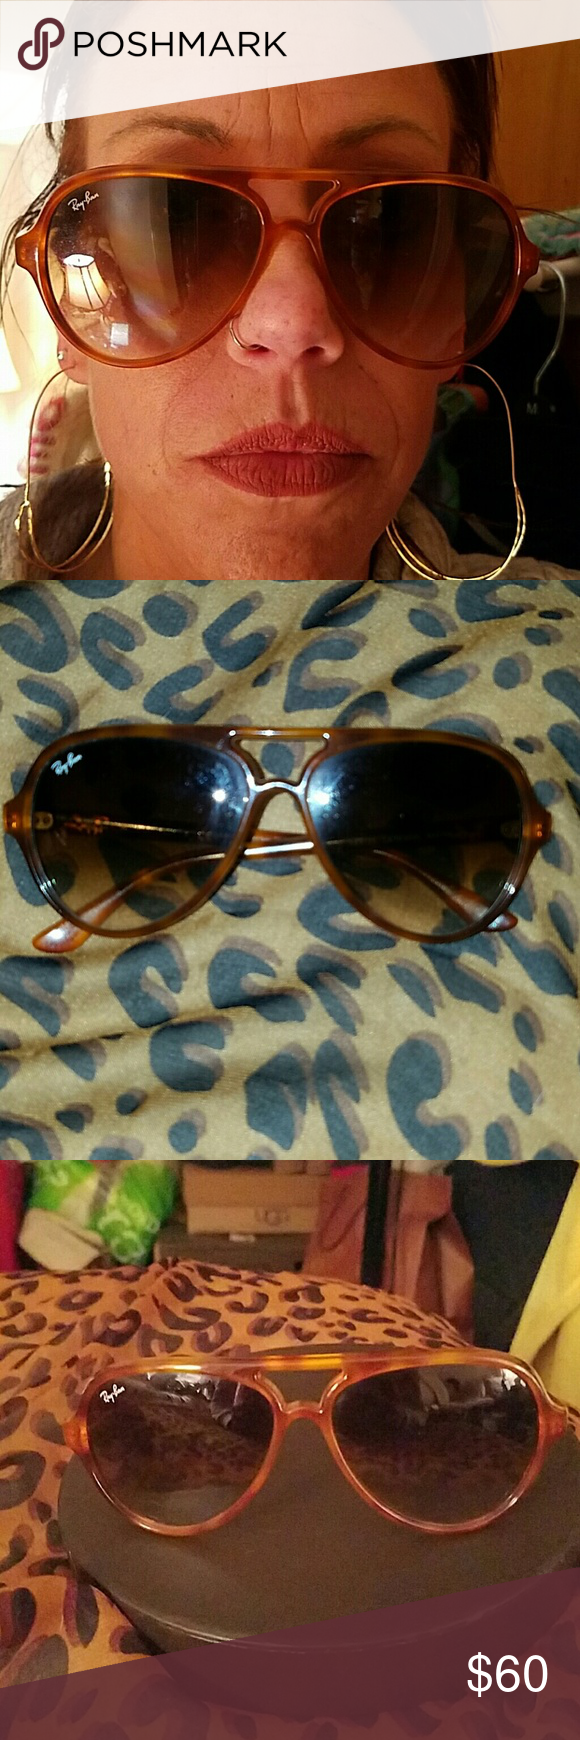 1a8e1238c6 Vintage Ray Ban Aviator Sunglasses - Authentic Lightweight Authentic Vintage  Ray-Ban Aviators. Who